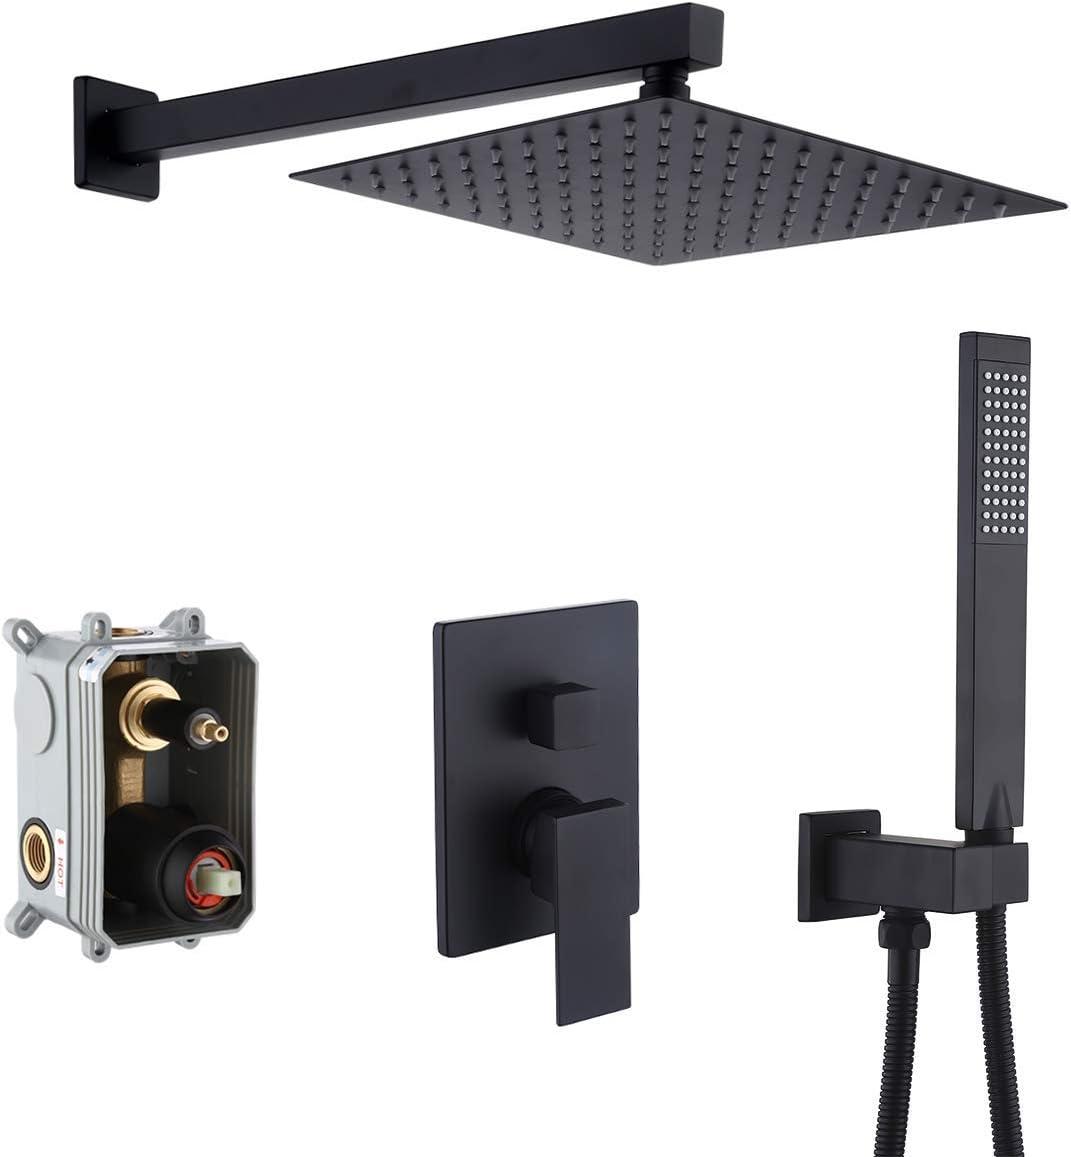 KES Pressure Balancing Rain Shower System Rough-in Valve Trim Kit Shower Faucet Set Complete Square Matte Black, XB6230-BK - -